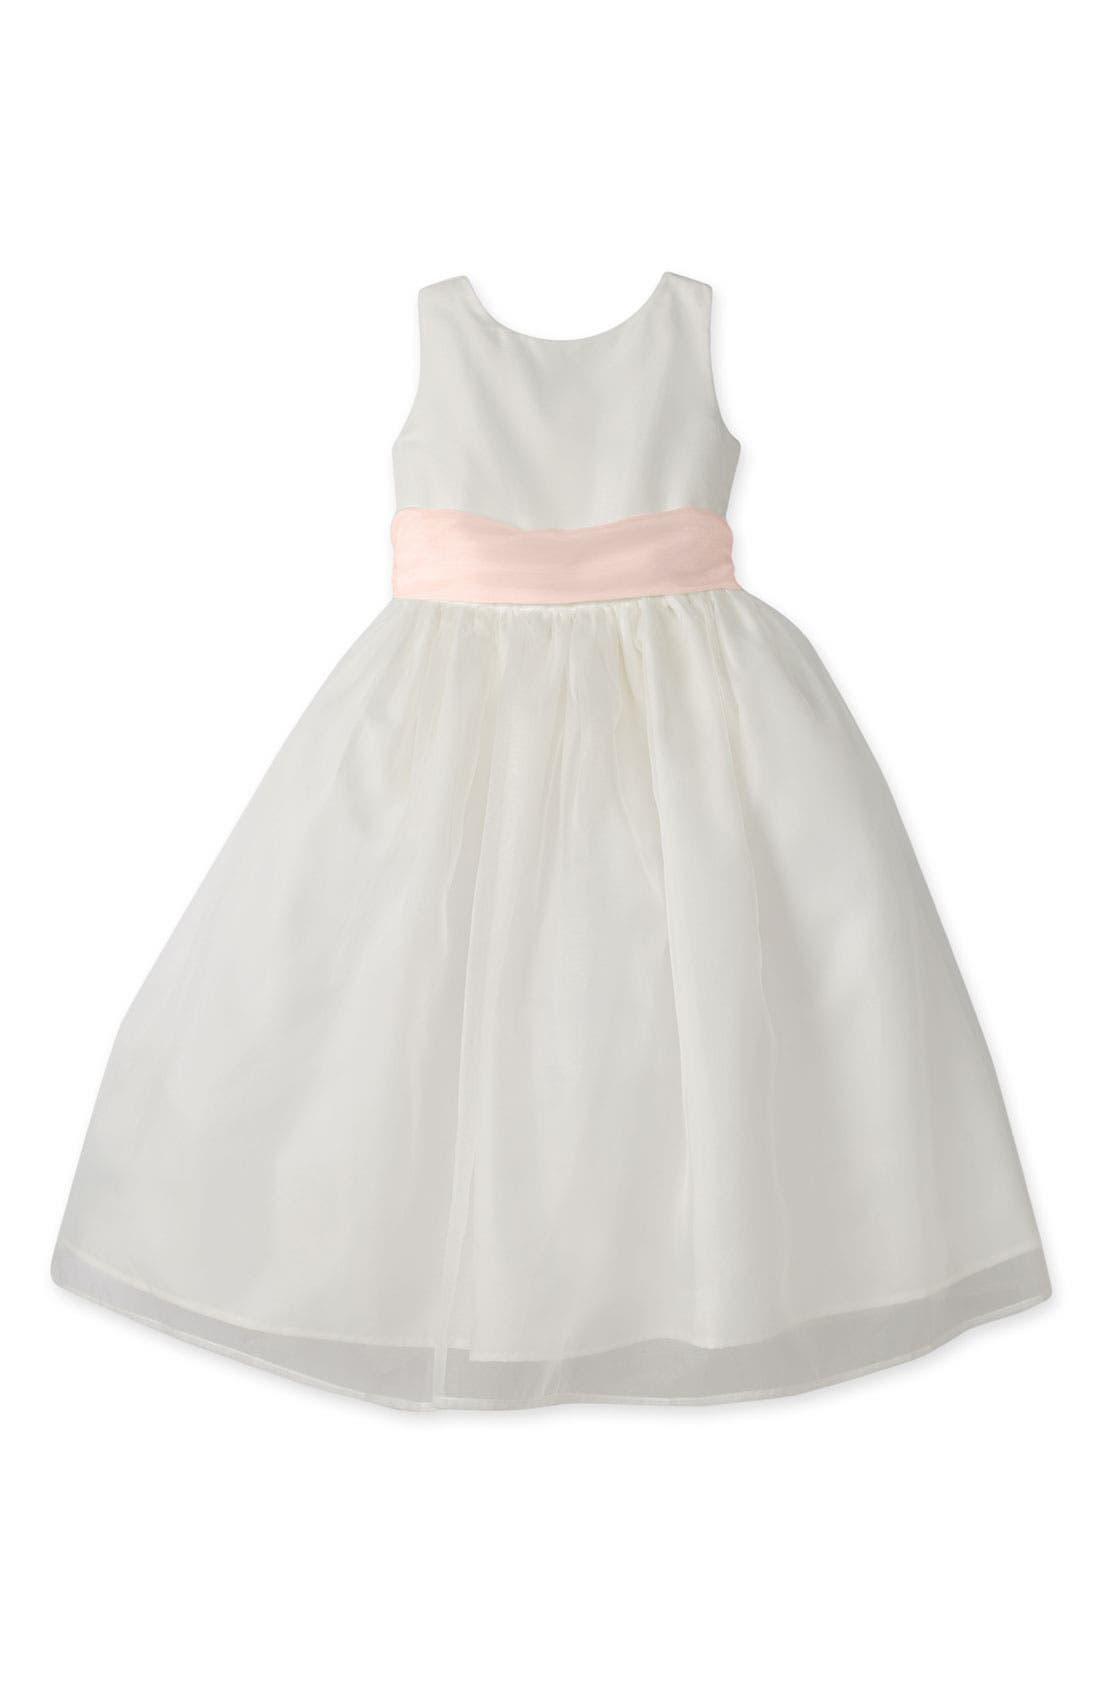 Alternate Image 1 Selected - Us Angels Sleeveless Organza Dress (Toddler Girls, Little Girls & Big Girls)